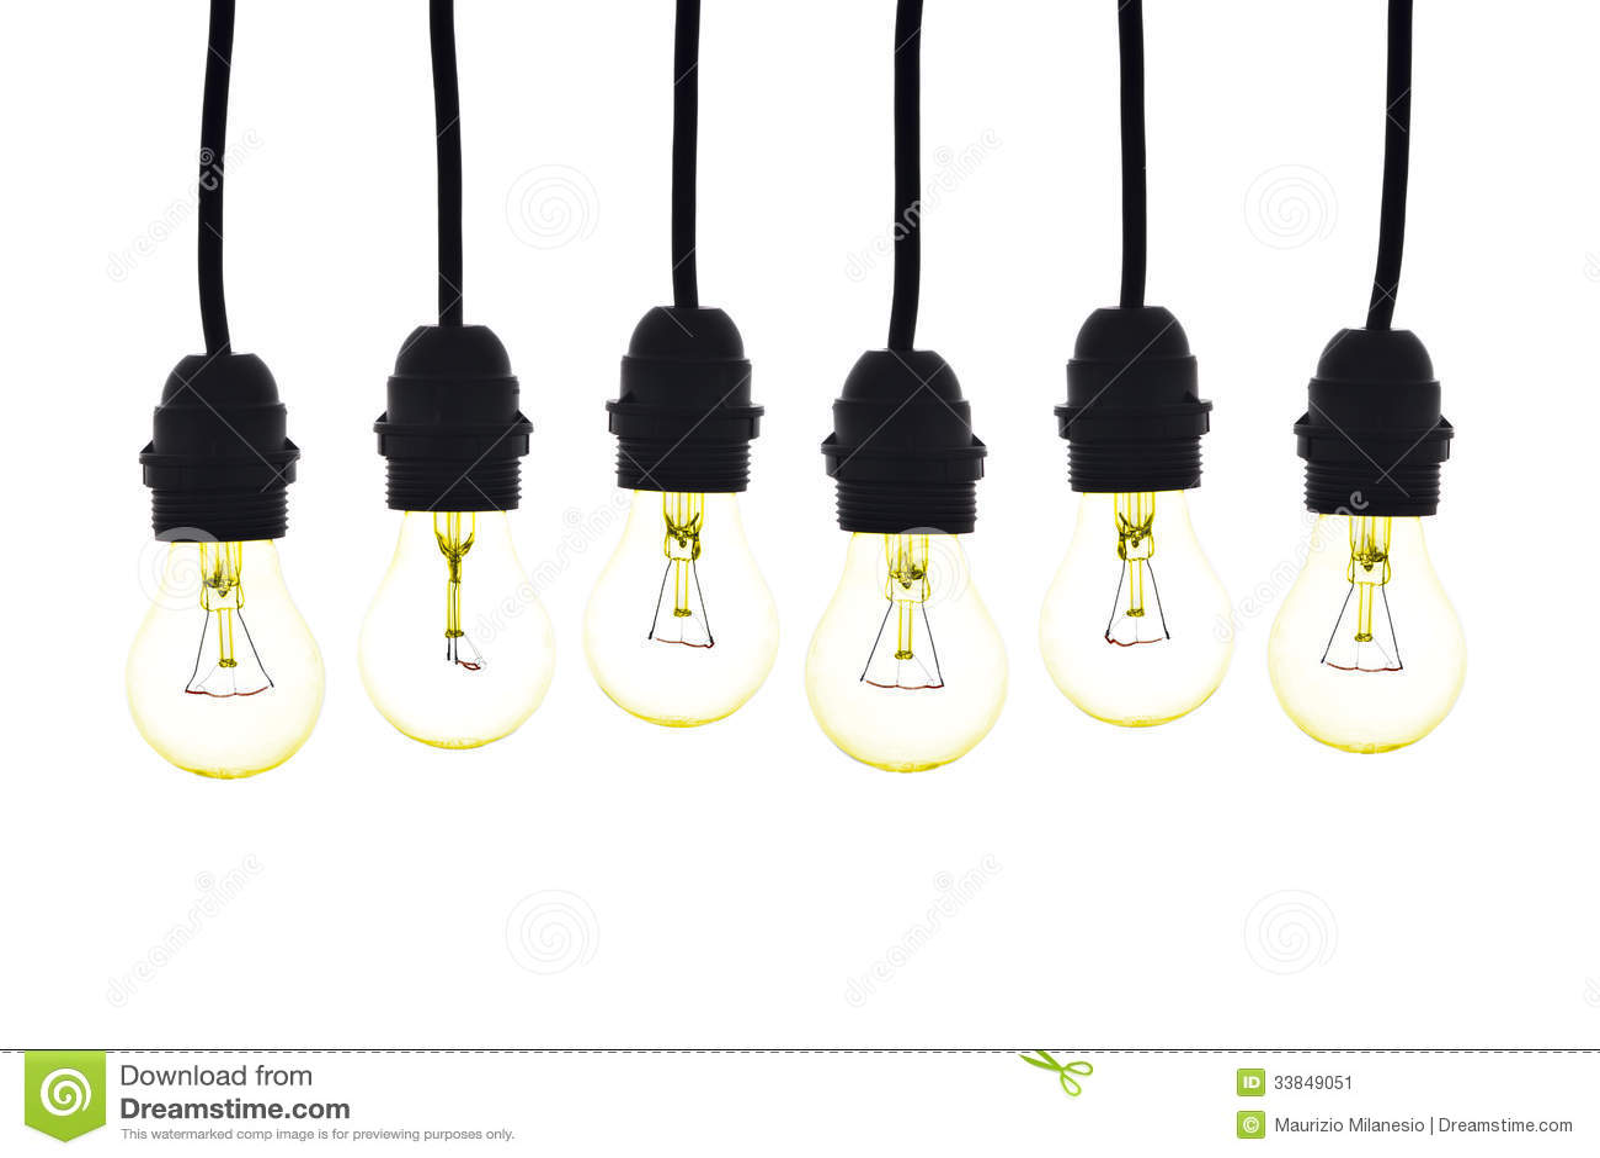 how to make colored light bulbs